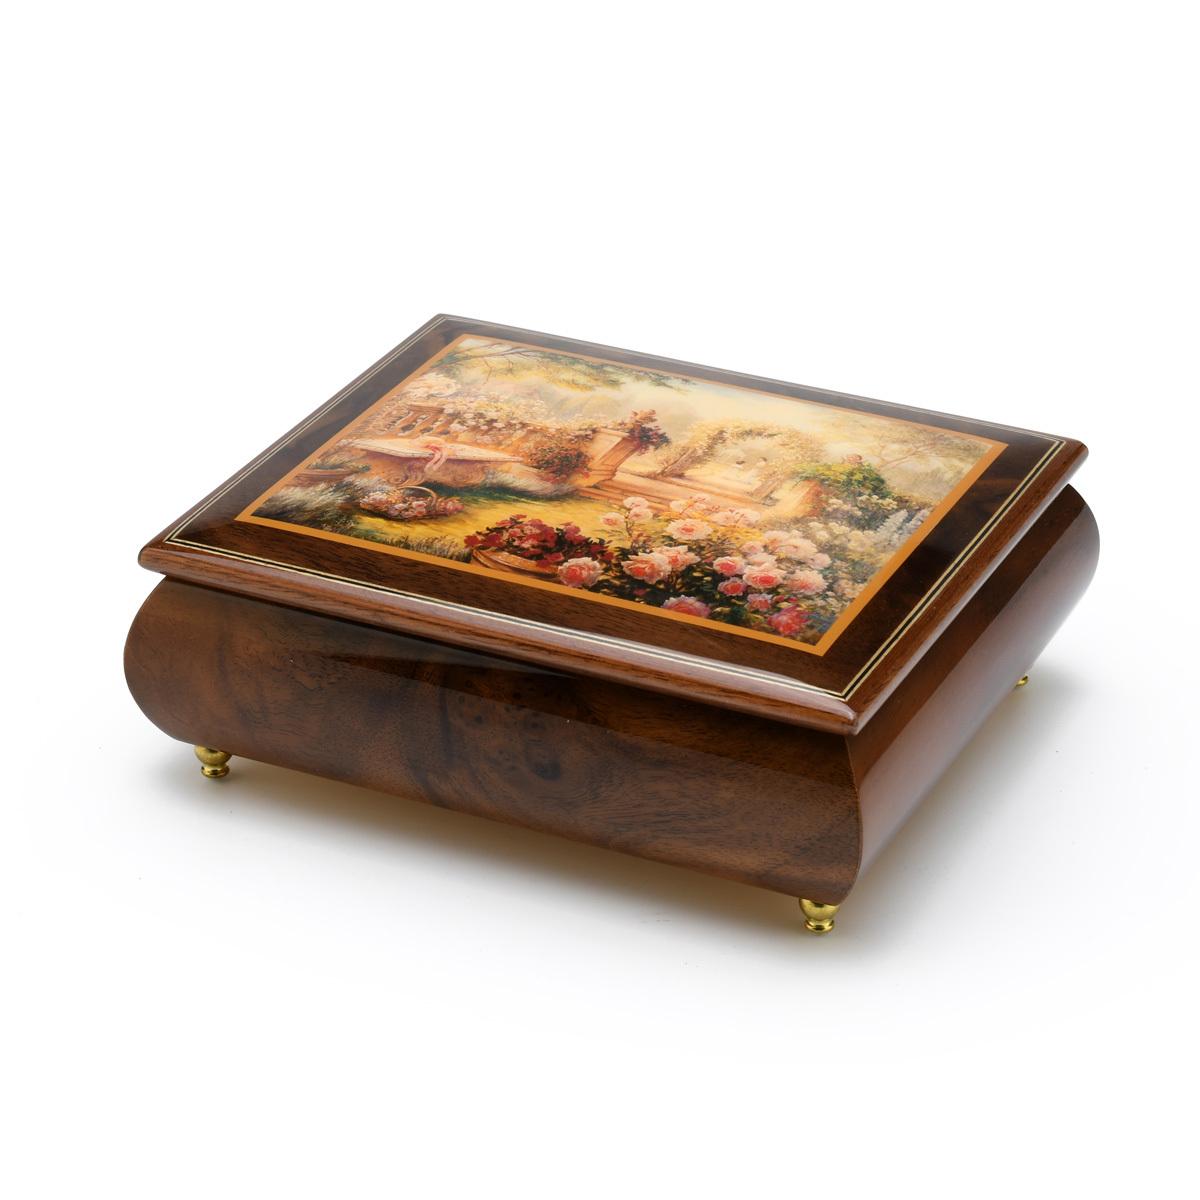 Lisas Garden Beautiful Art Box from Ercolano